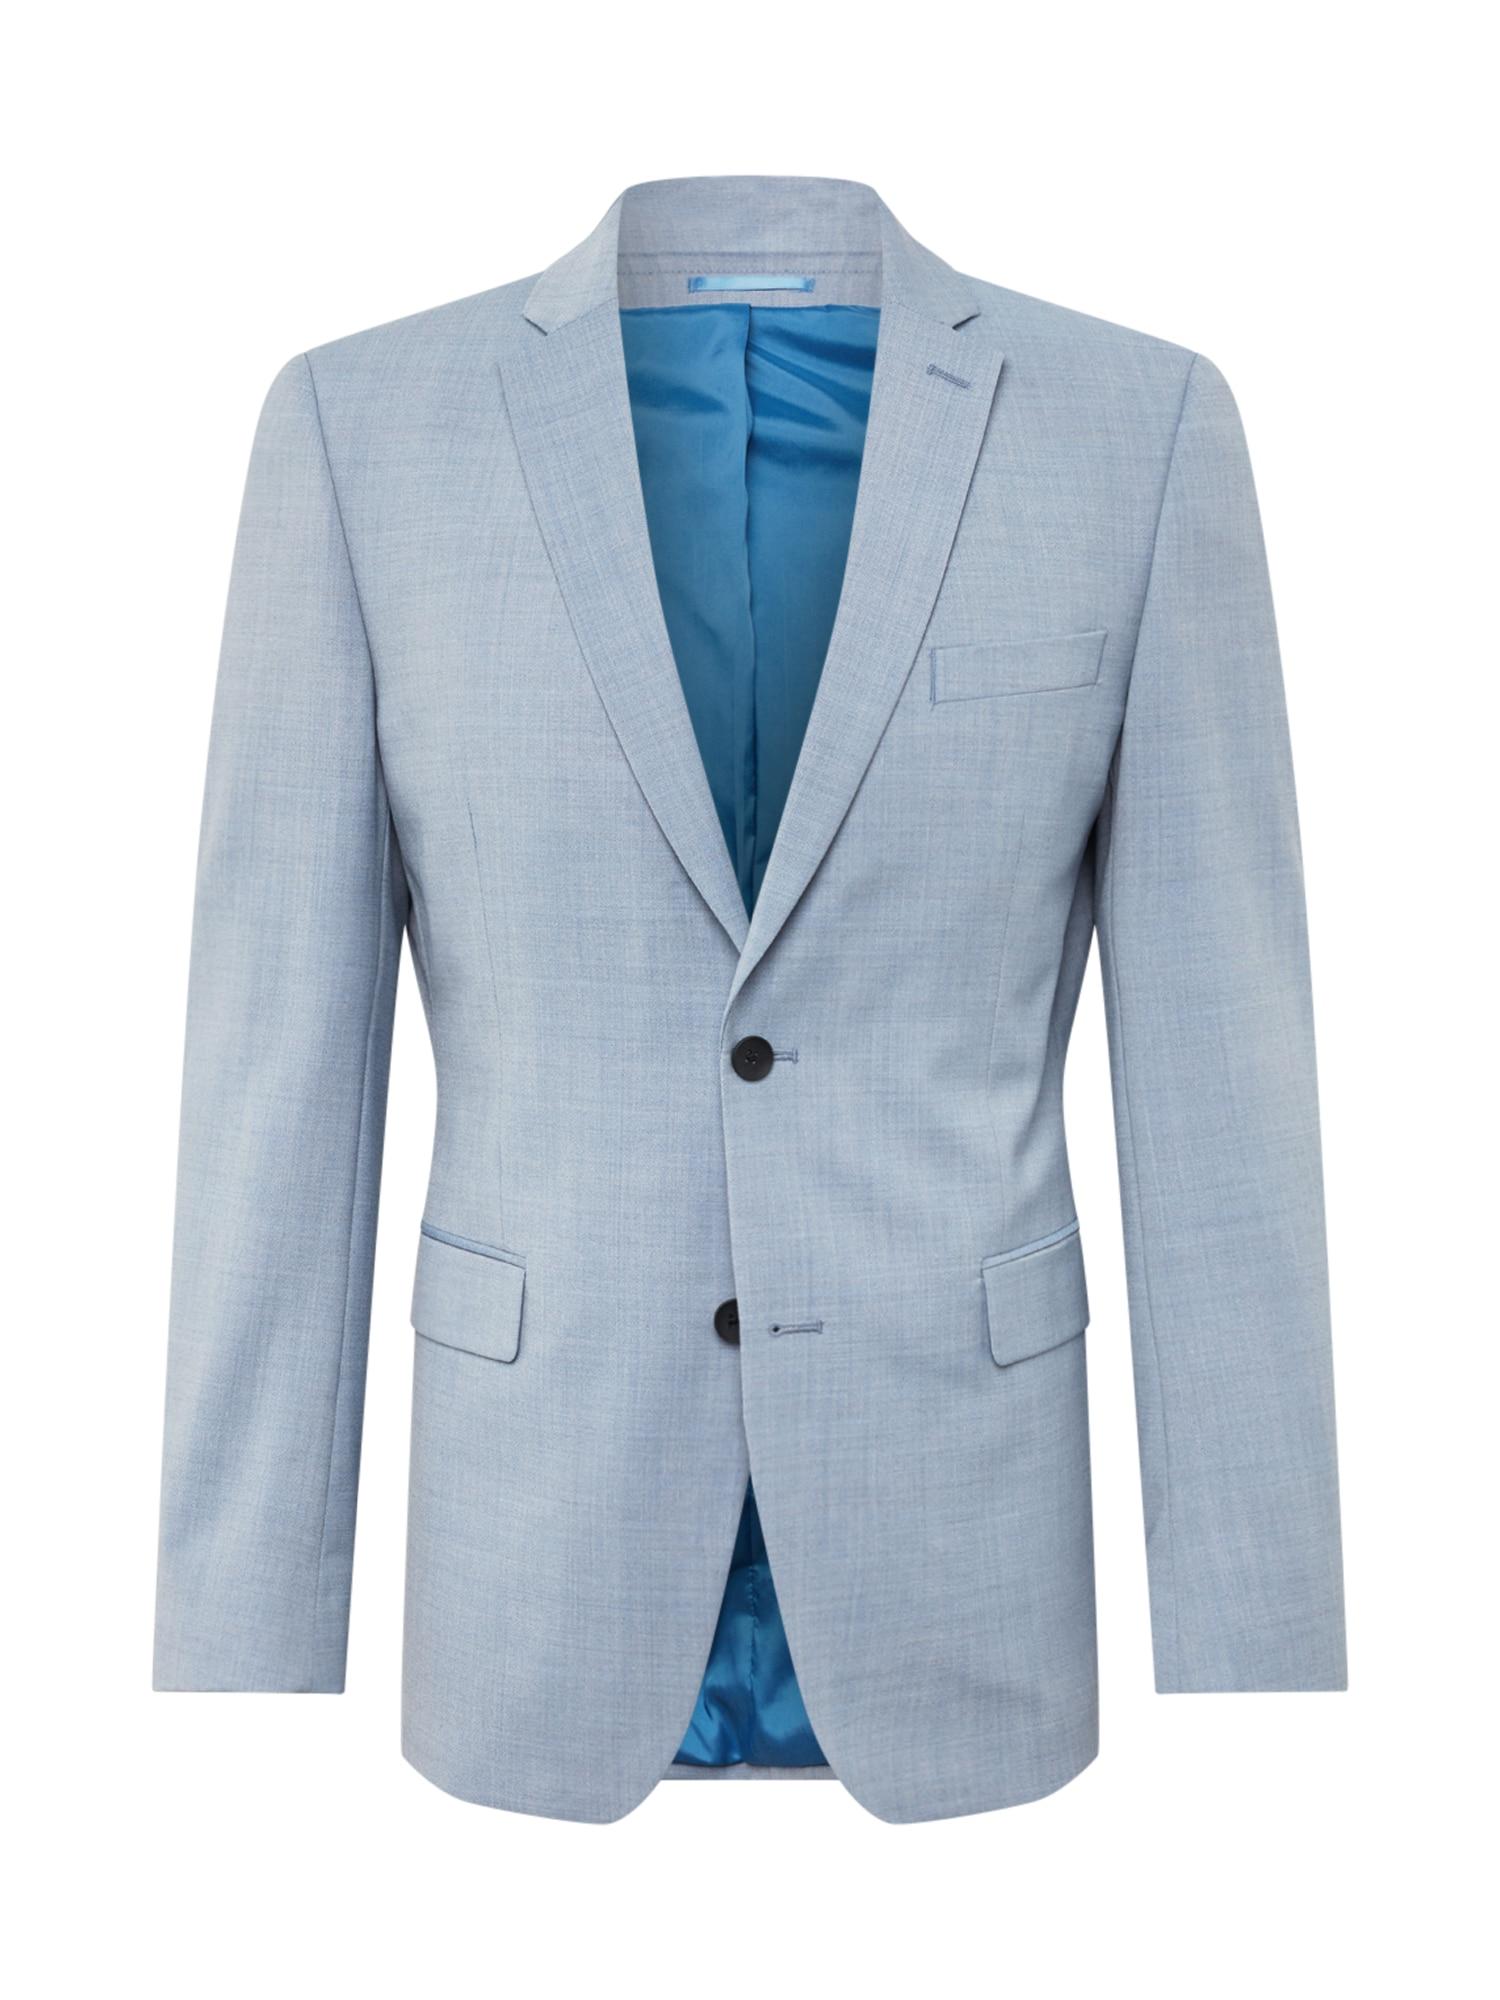 Oblek actv melange světlemodrá Esprit Collection